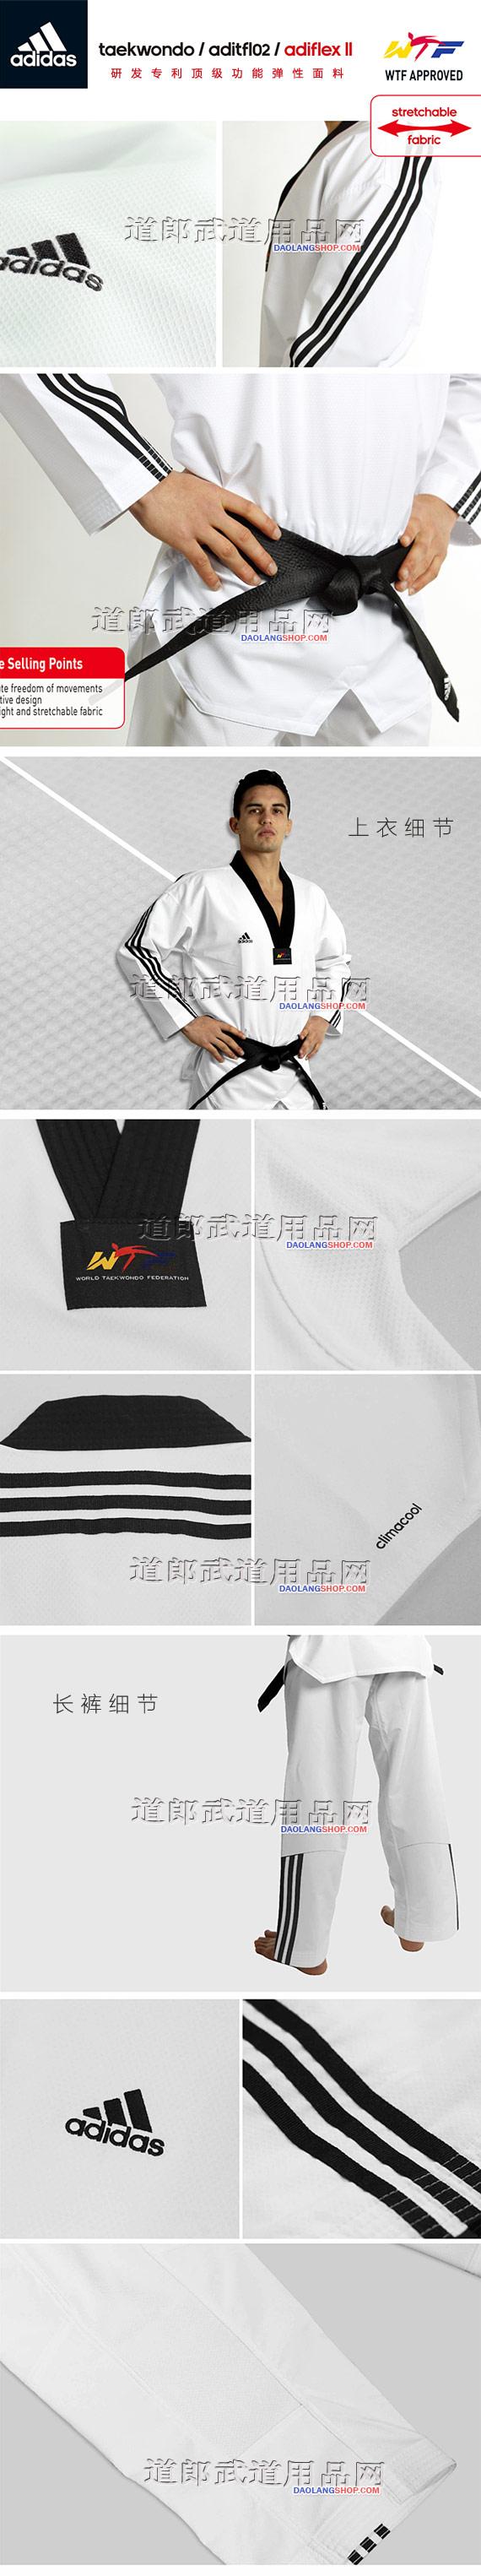 http://pic.daolangshop.com/adidas/flex3s/FLEX2detil_03.jpg